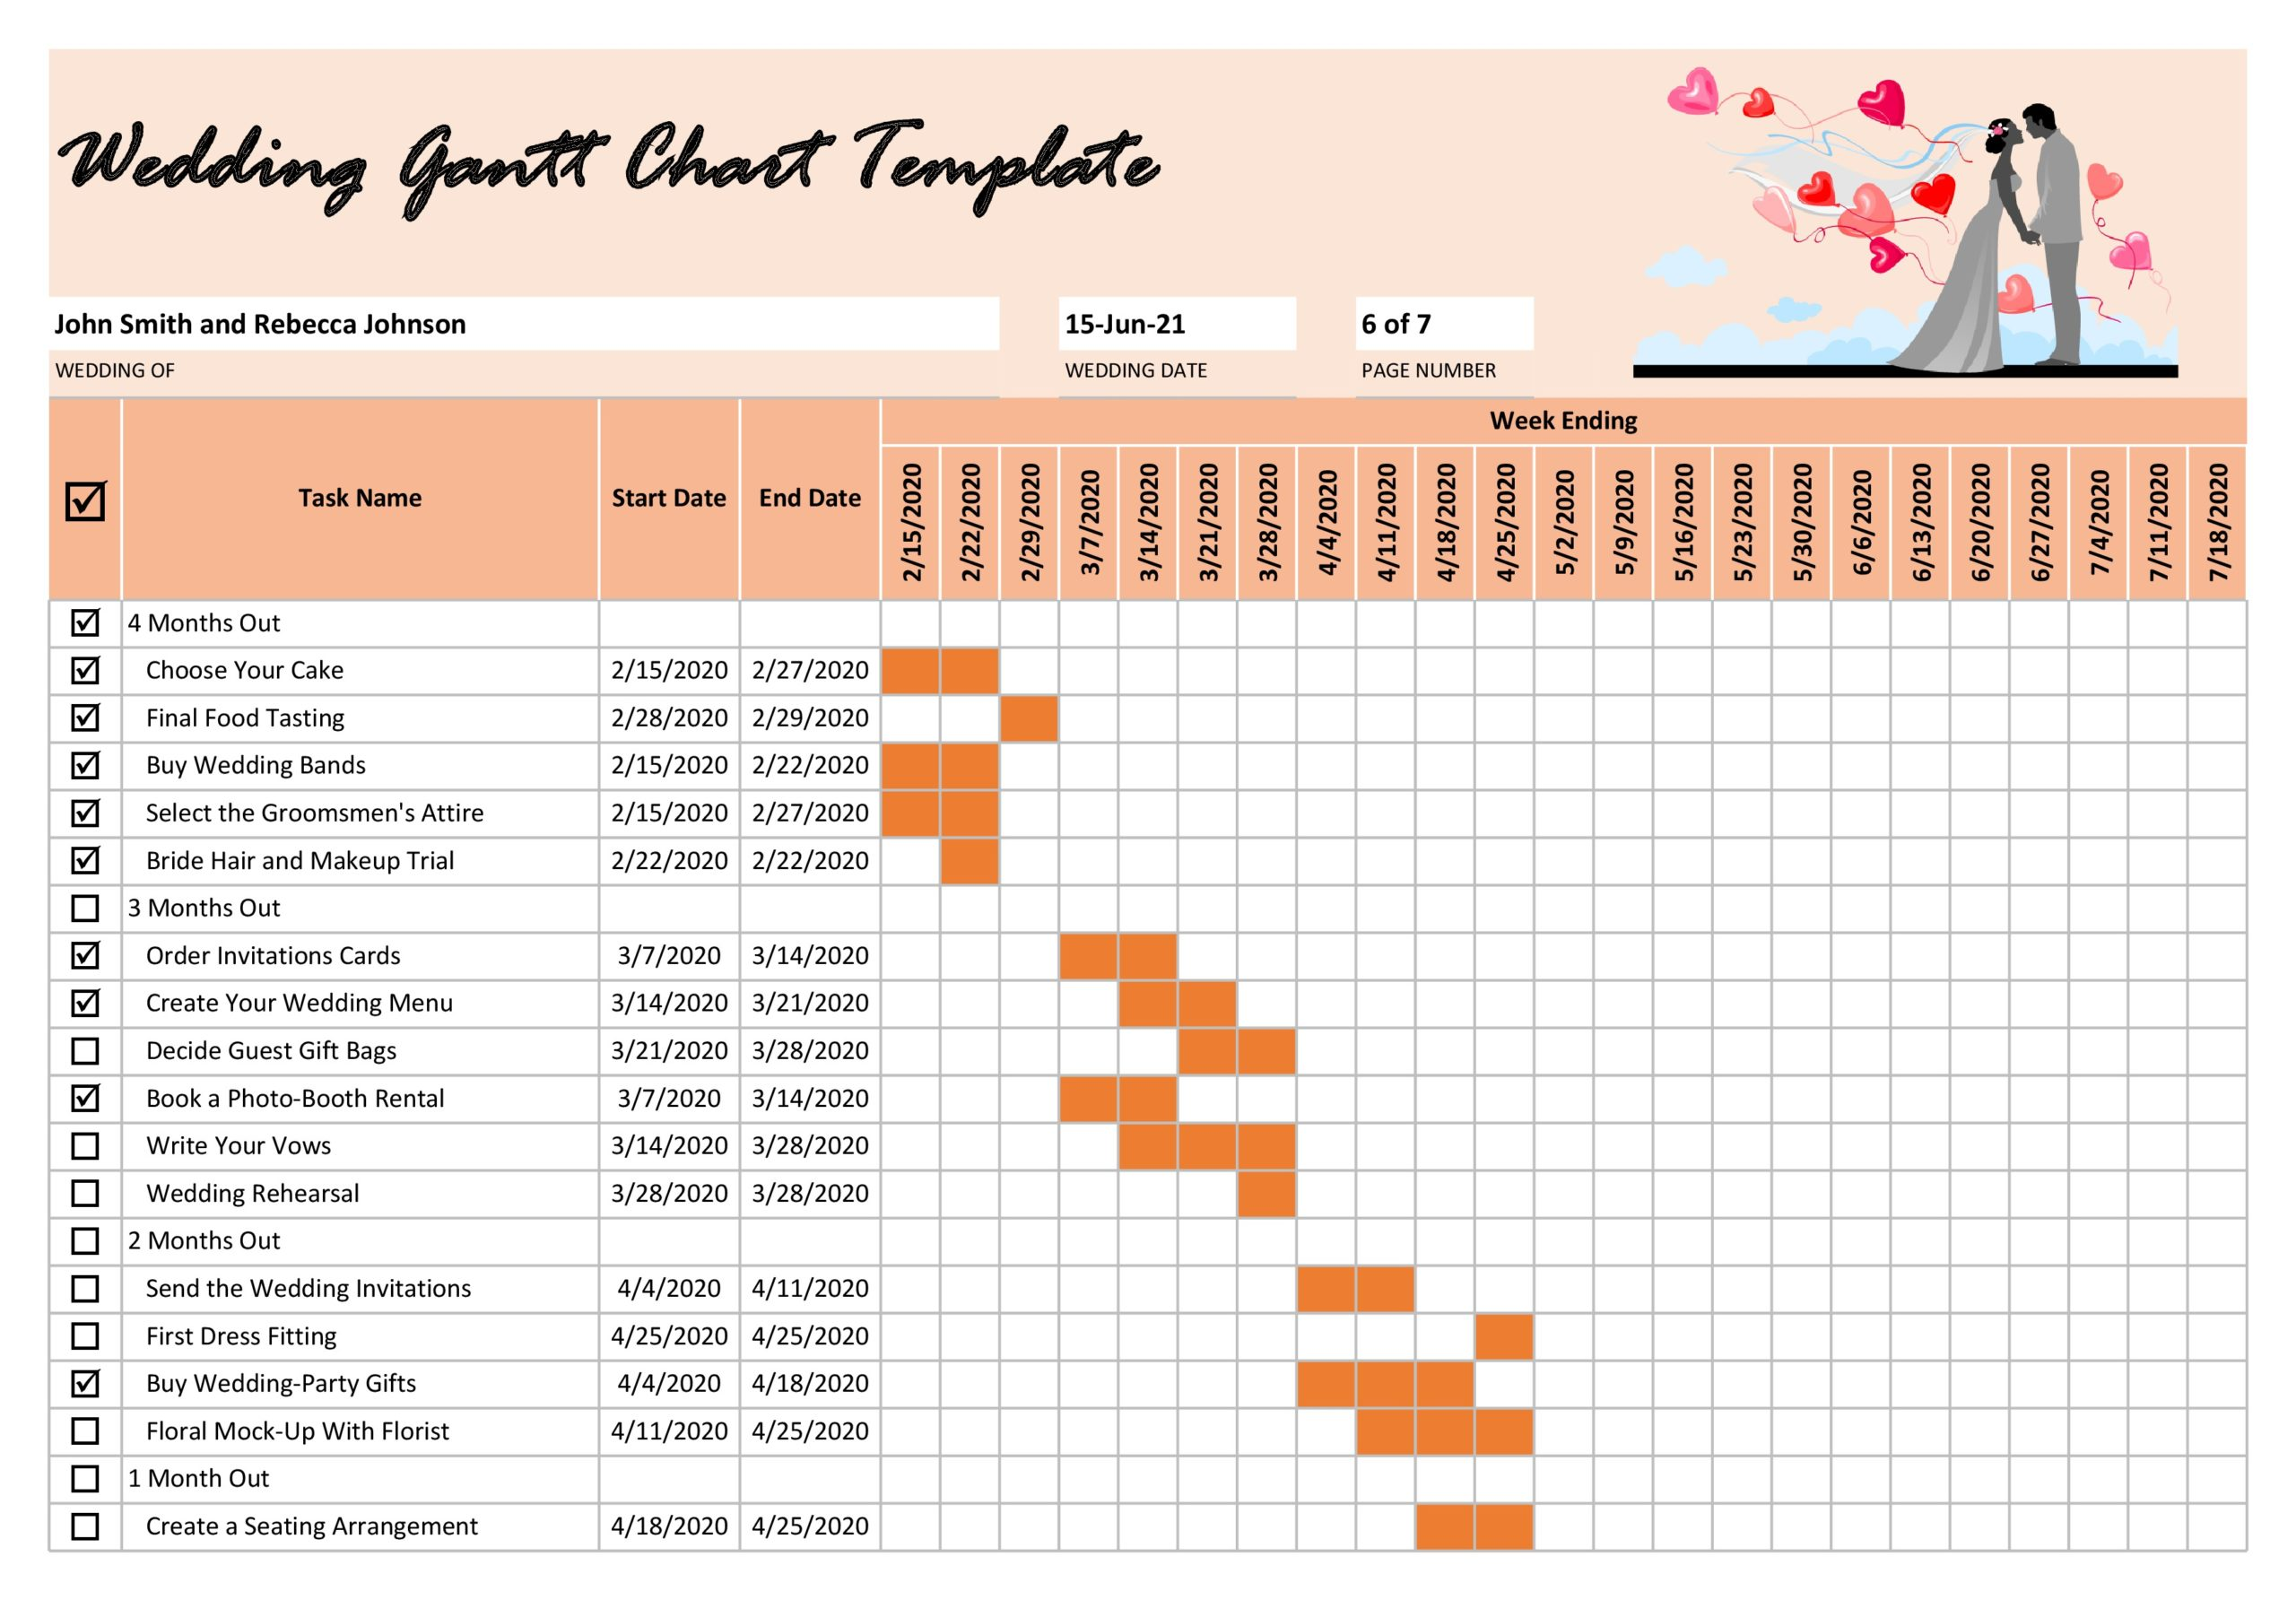 Free Wedding Gantt Chart Template - TemplateLab